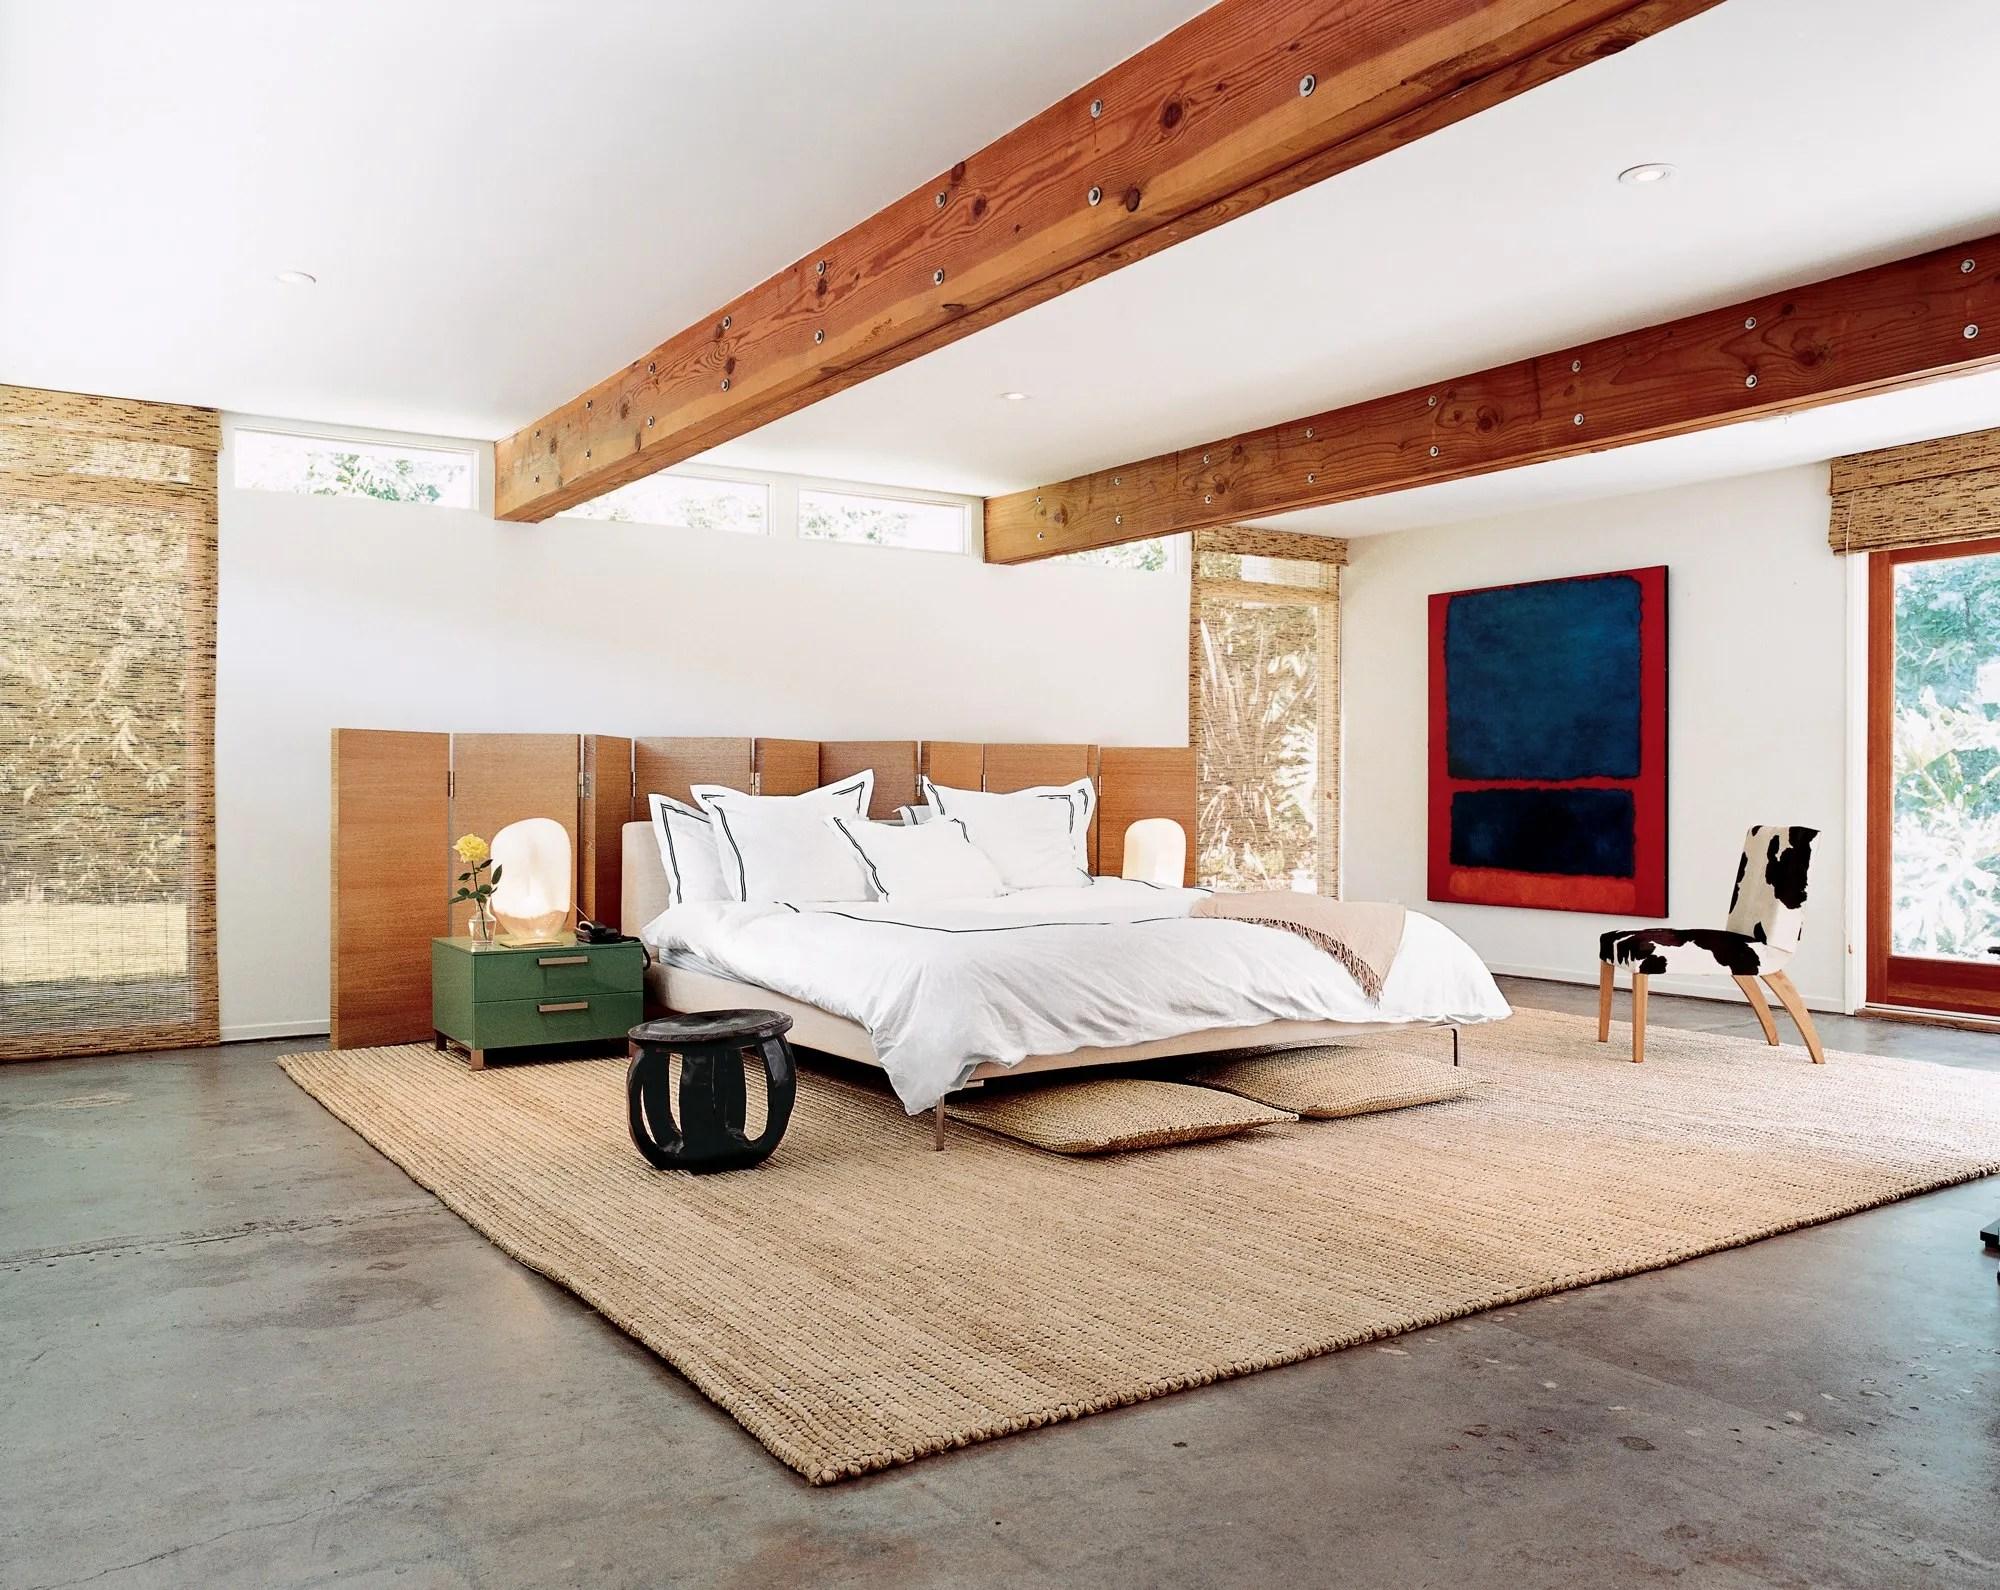 14 summer bedding ideas to sleep